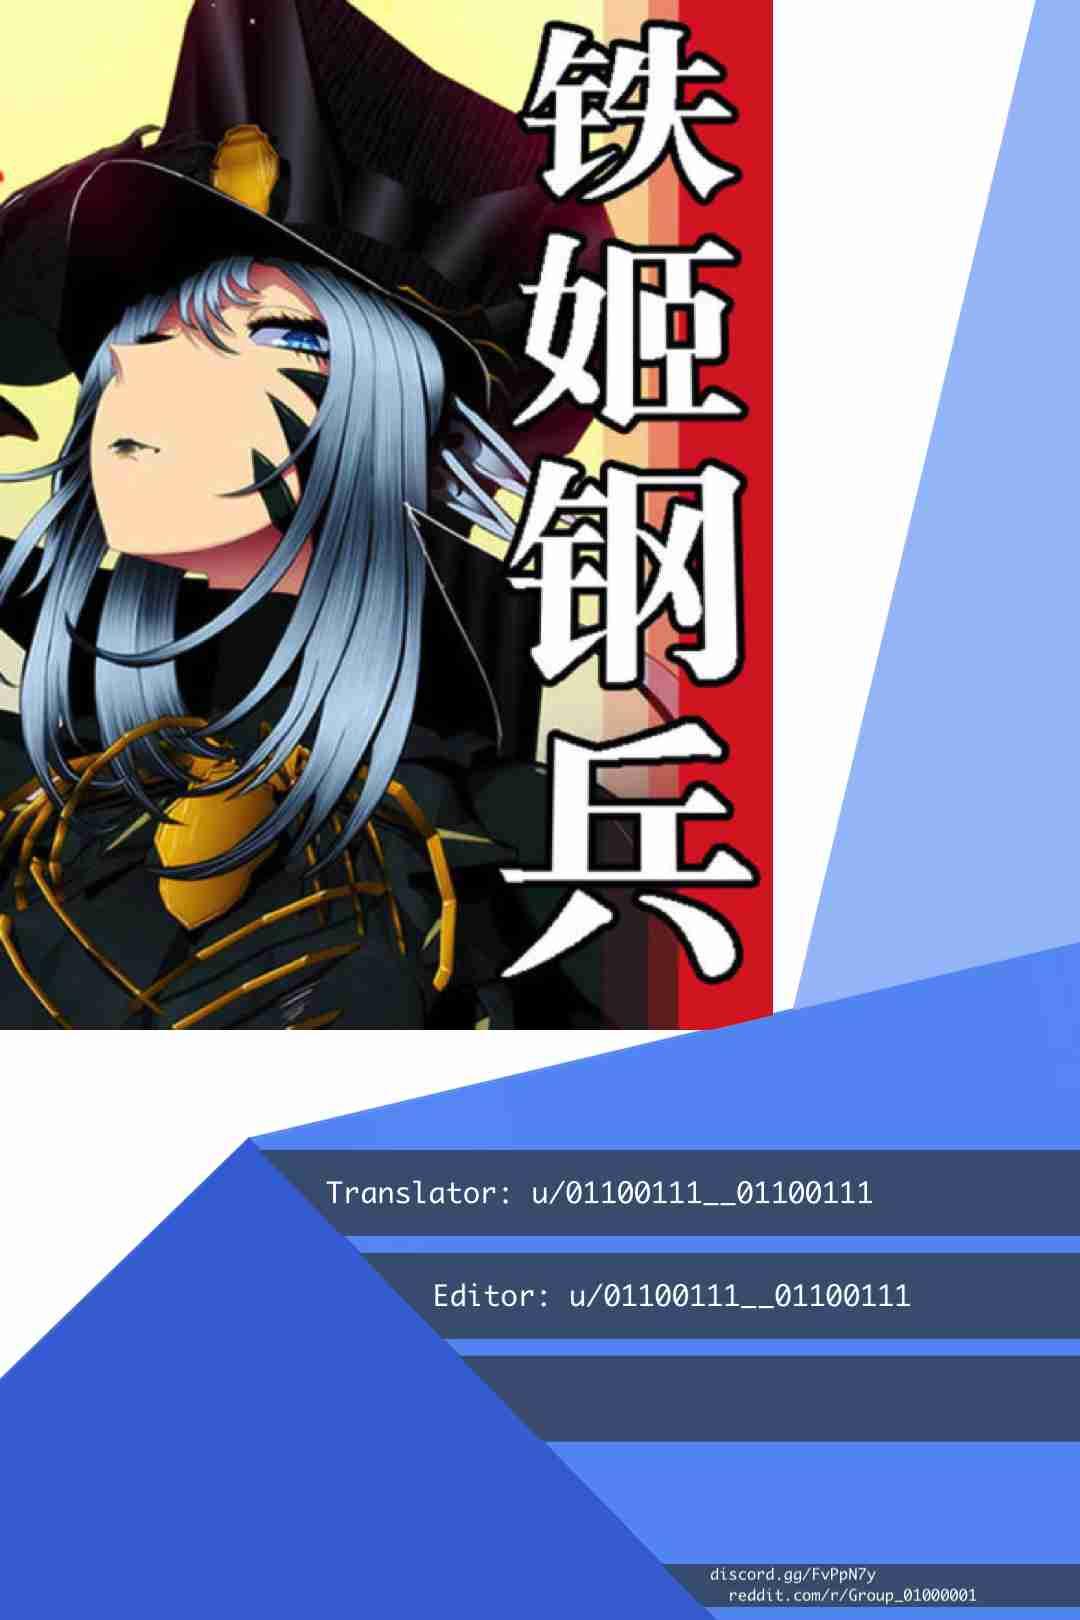 https://manga.mangadogs.com/comics/pic2/59/24443/770334/861180853c3c32a9d29791a80a8f21ec.jpg Page 1